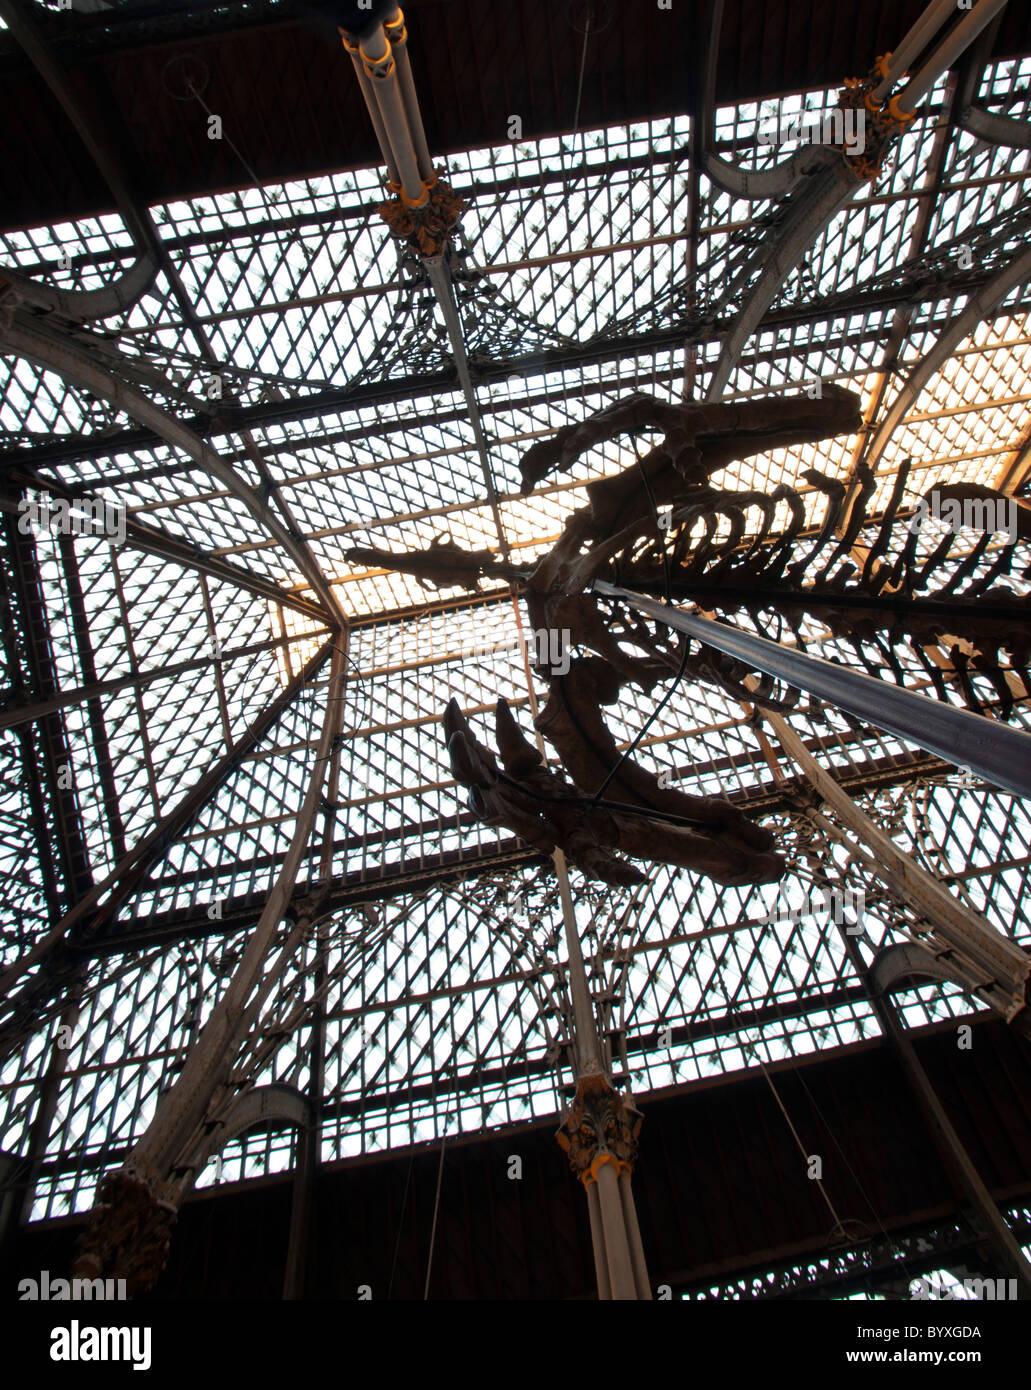 Dinosaur at Pitt Rivers Museum Oxford - Stock Image